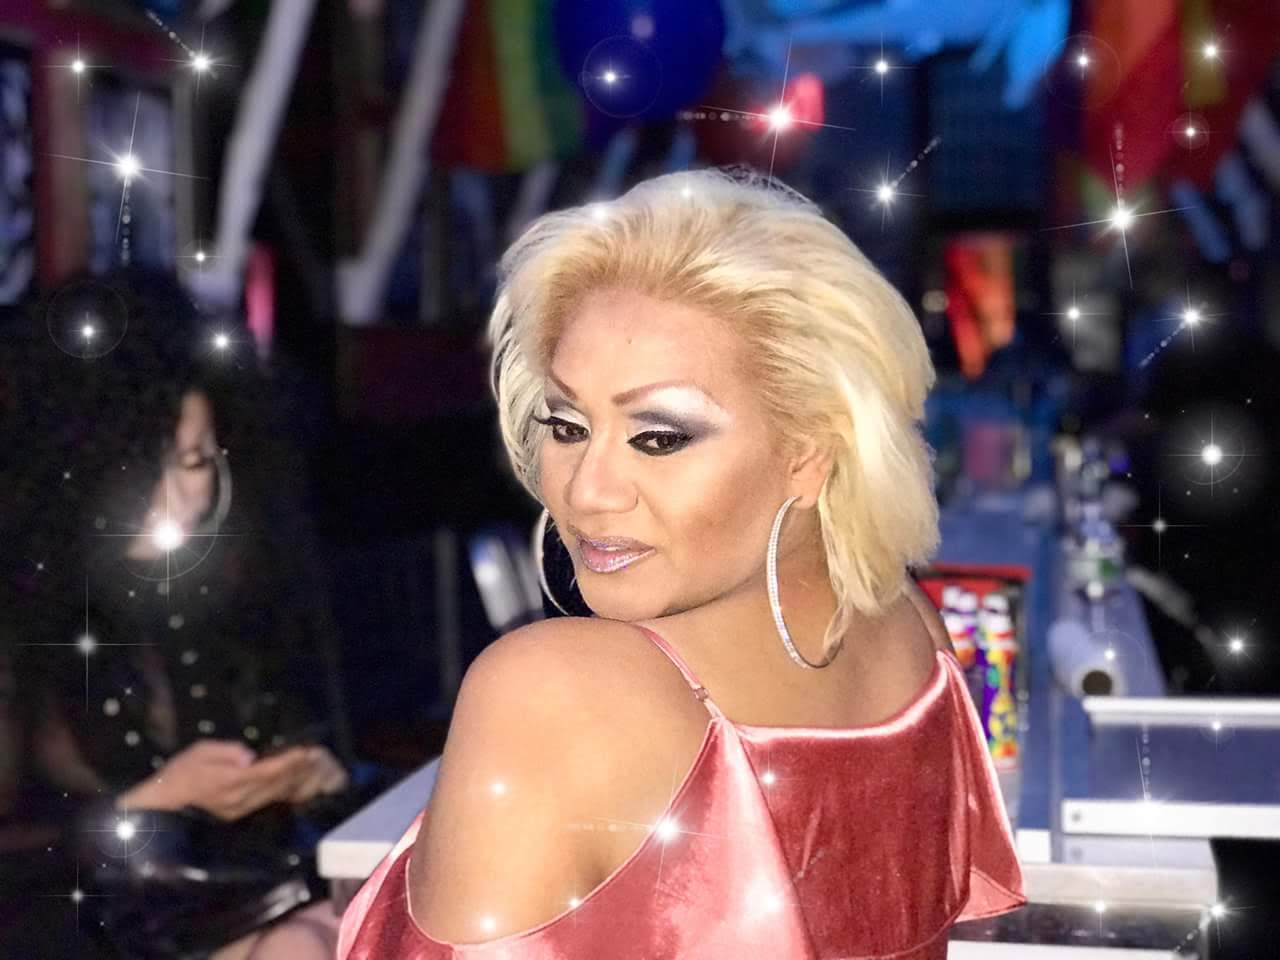 Karla Profile, Escort in Washington DC, 3474181512